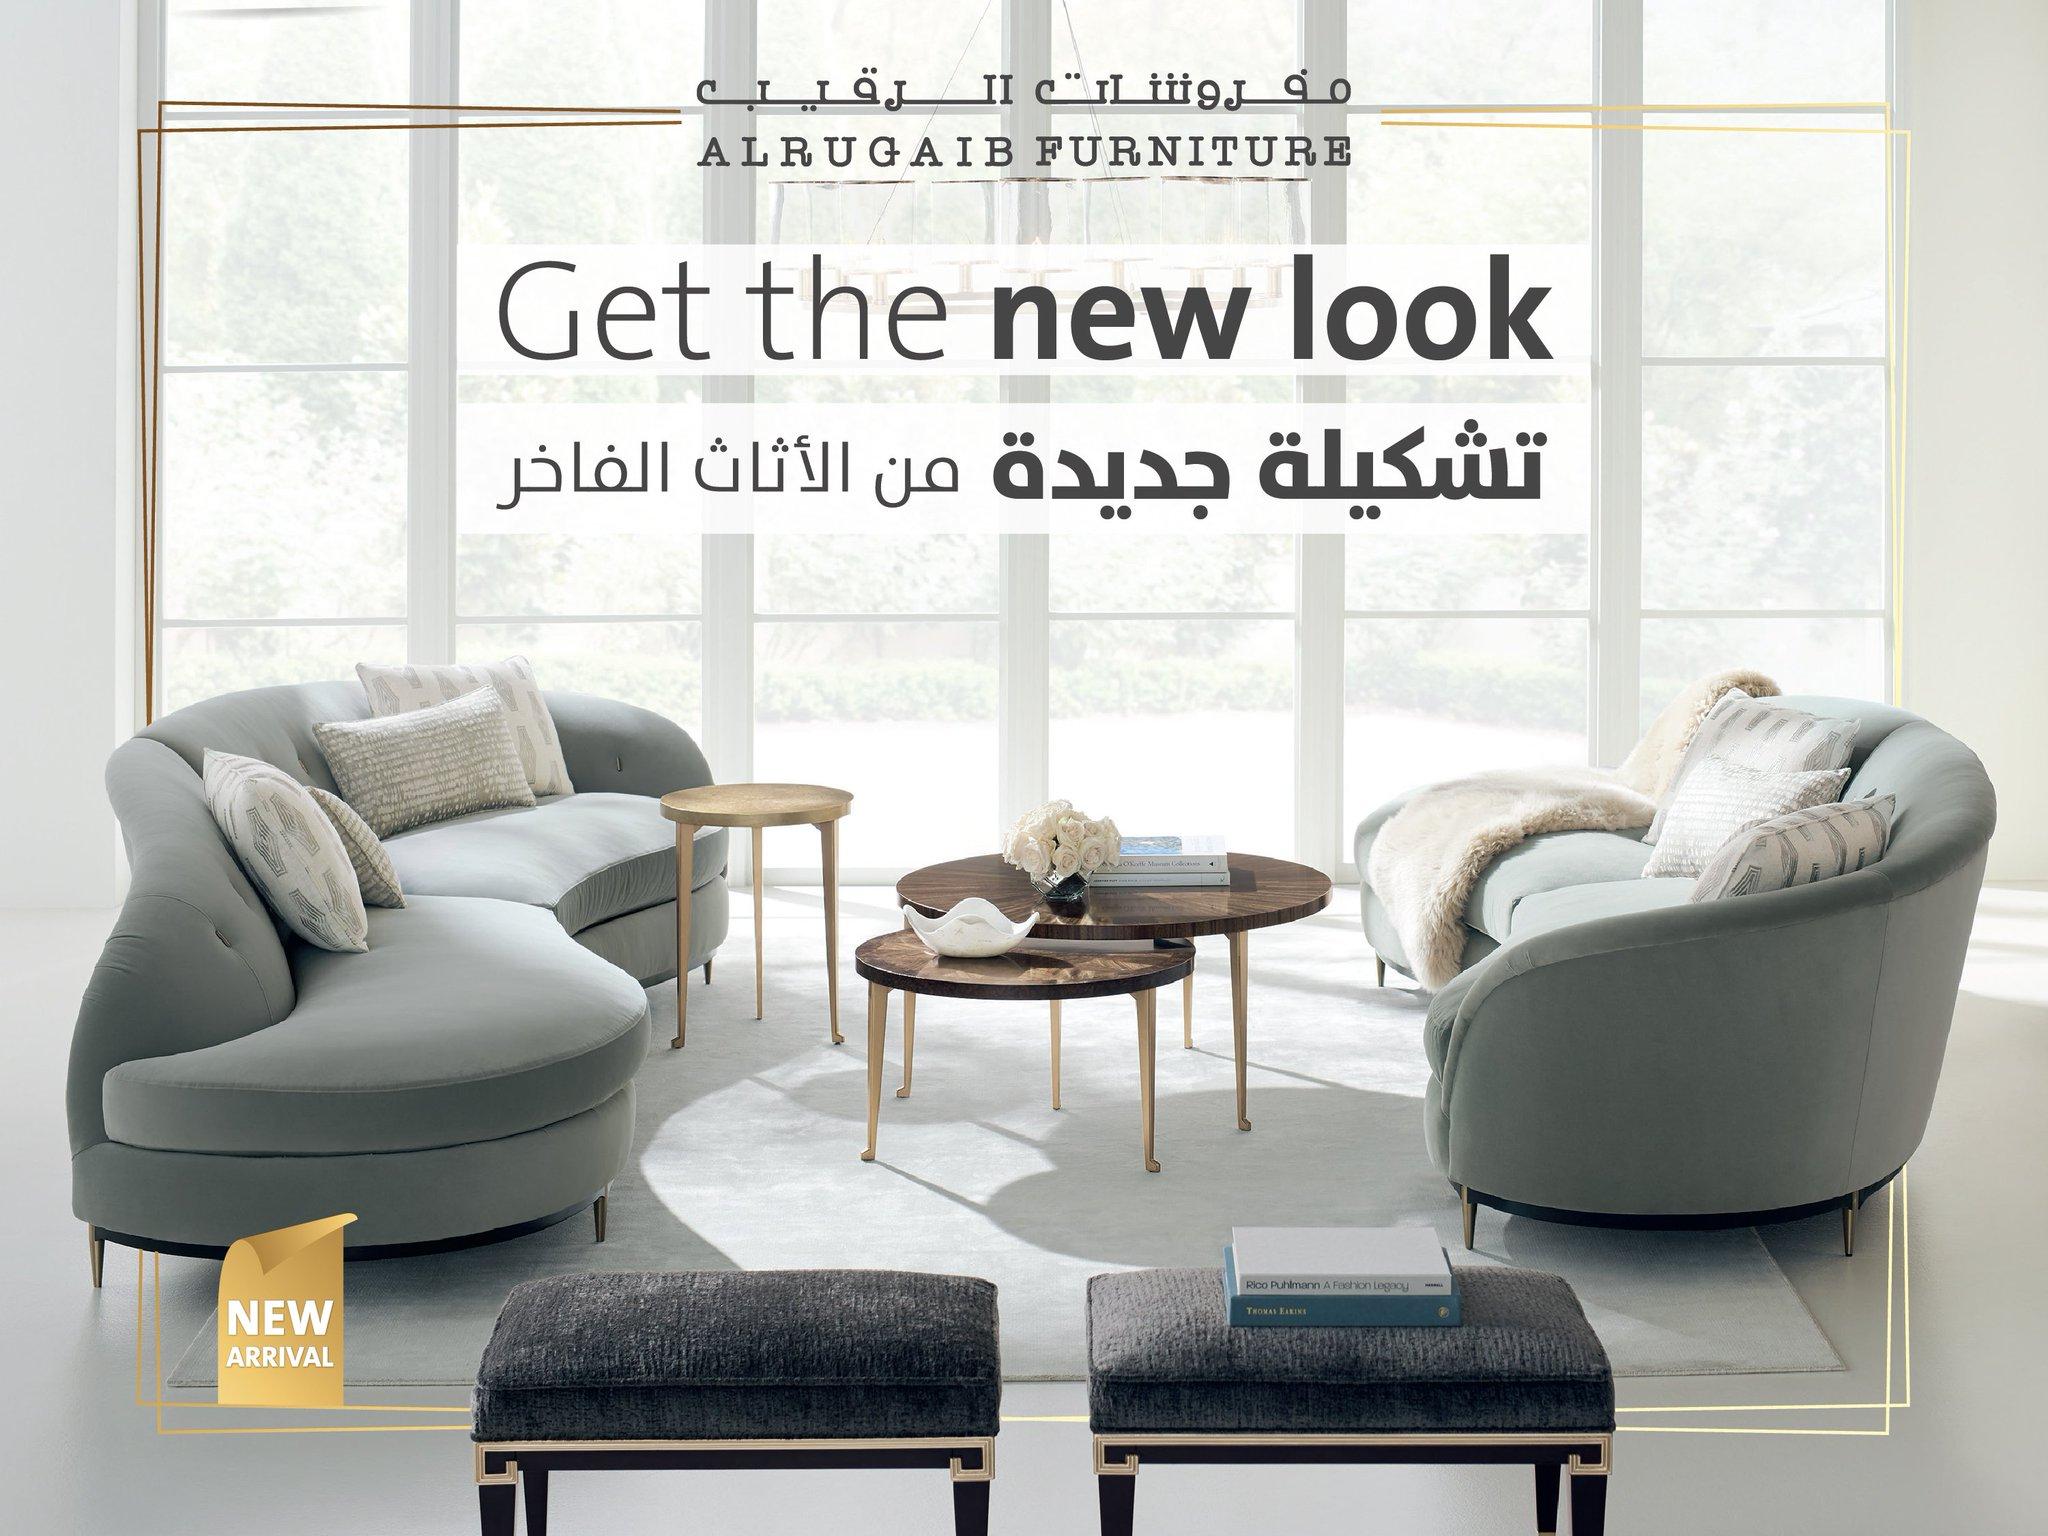 مفروشات الرقيب Alrugaib Furniture On Twitter تشكيلة 2019 الجديدة The New 2019 Collection حياكم Welcome Khobar Riyadh Jeddah Shop Online Https T Co A1eux1t1cr